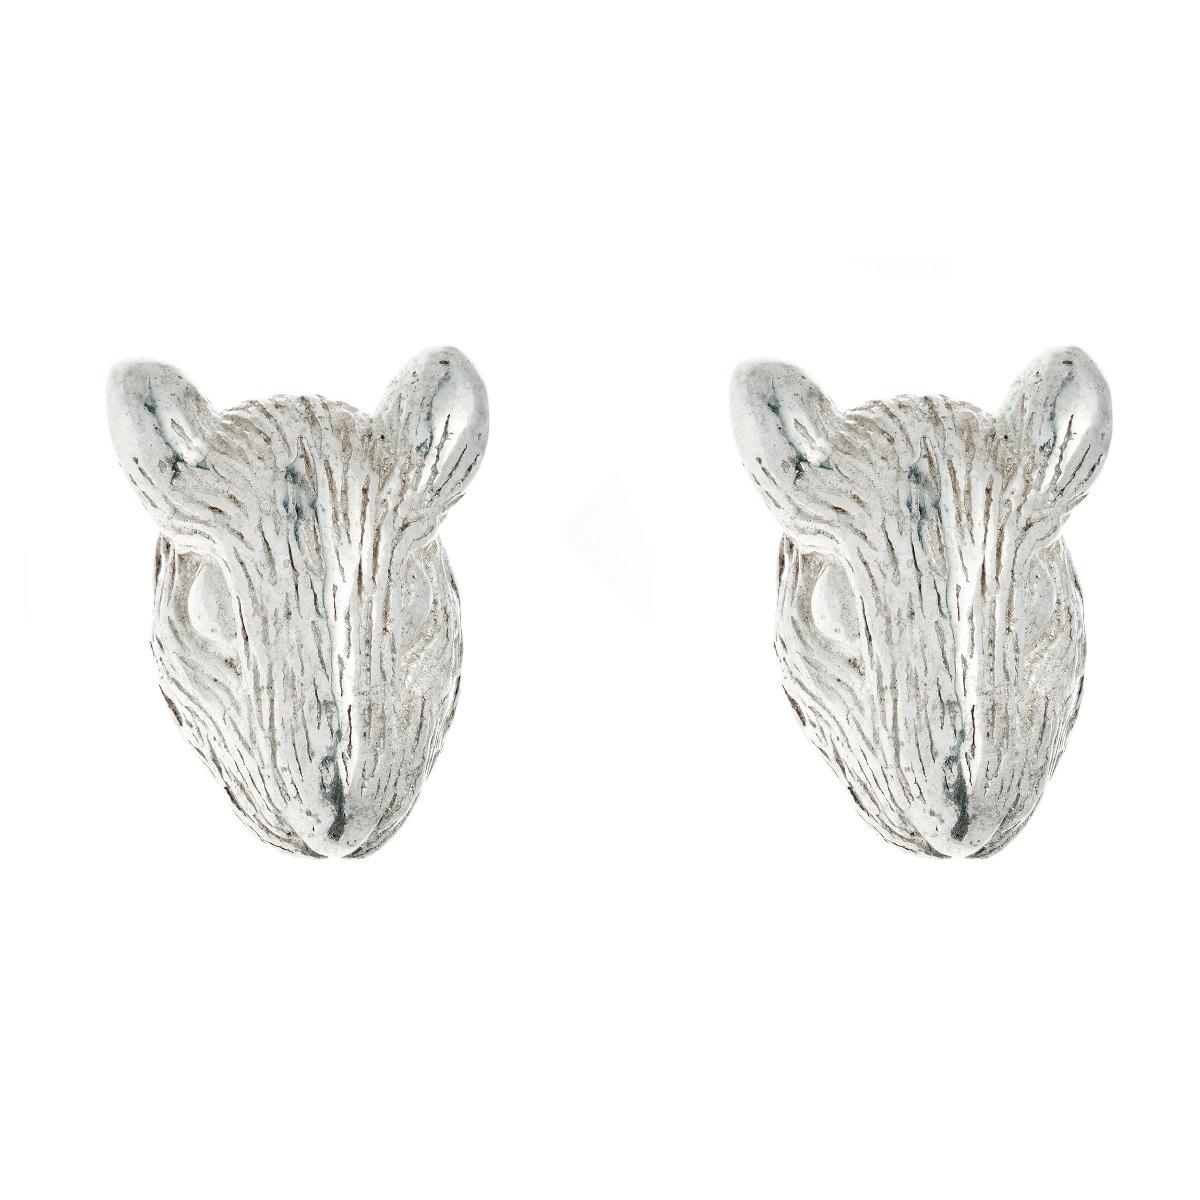 Chinese zodiac stud earrings (rat)